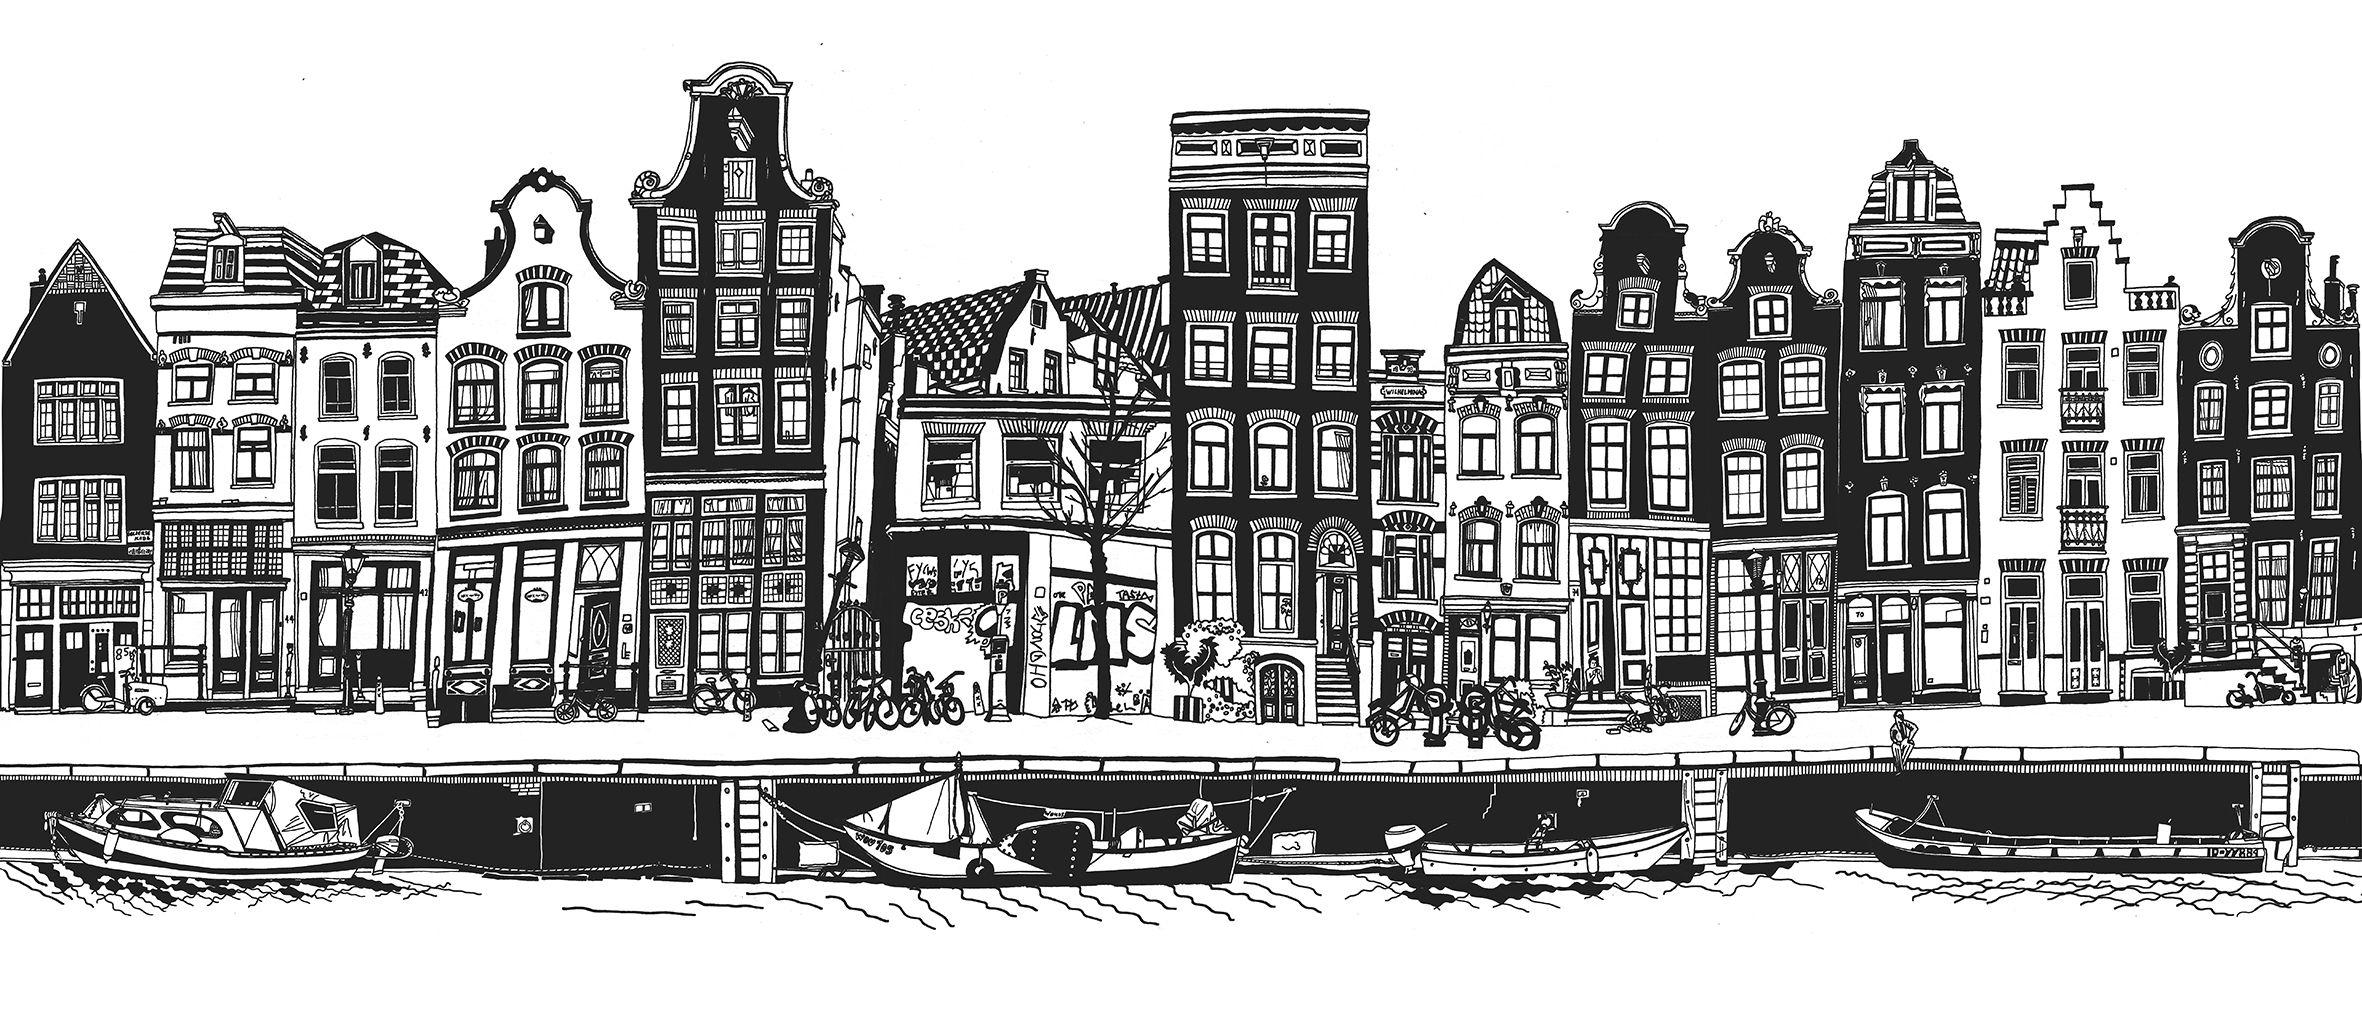 Amsterdam Black And White Http Www Studioellessi Com Store P81 Print Amsterdam Black And White 28 23140011 29 Amsterdam Houses Amsterdam Art Skyline Drawing